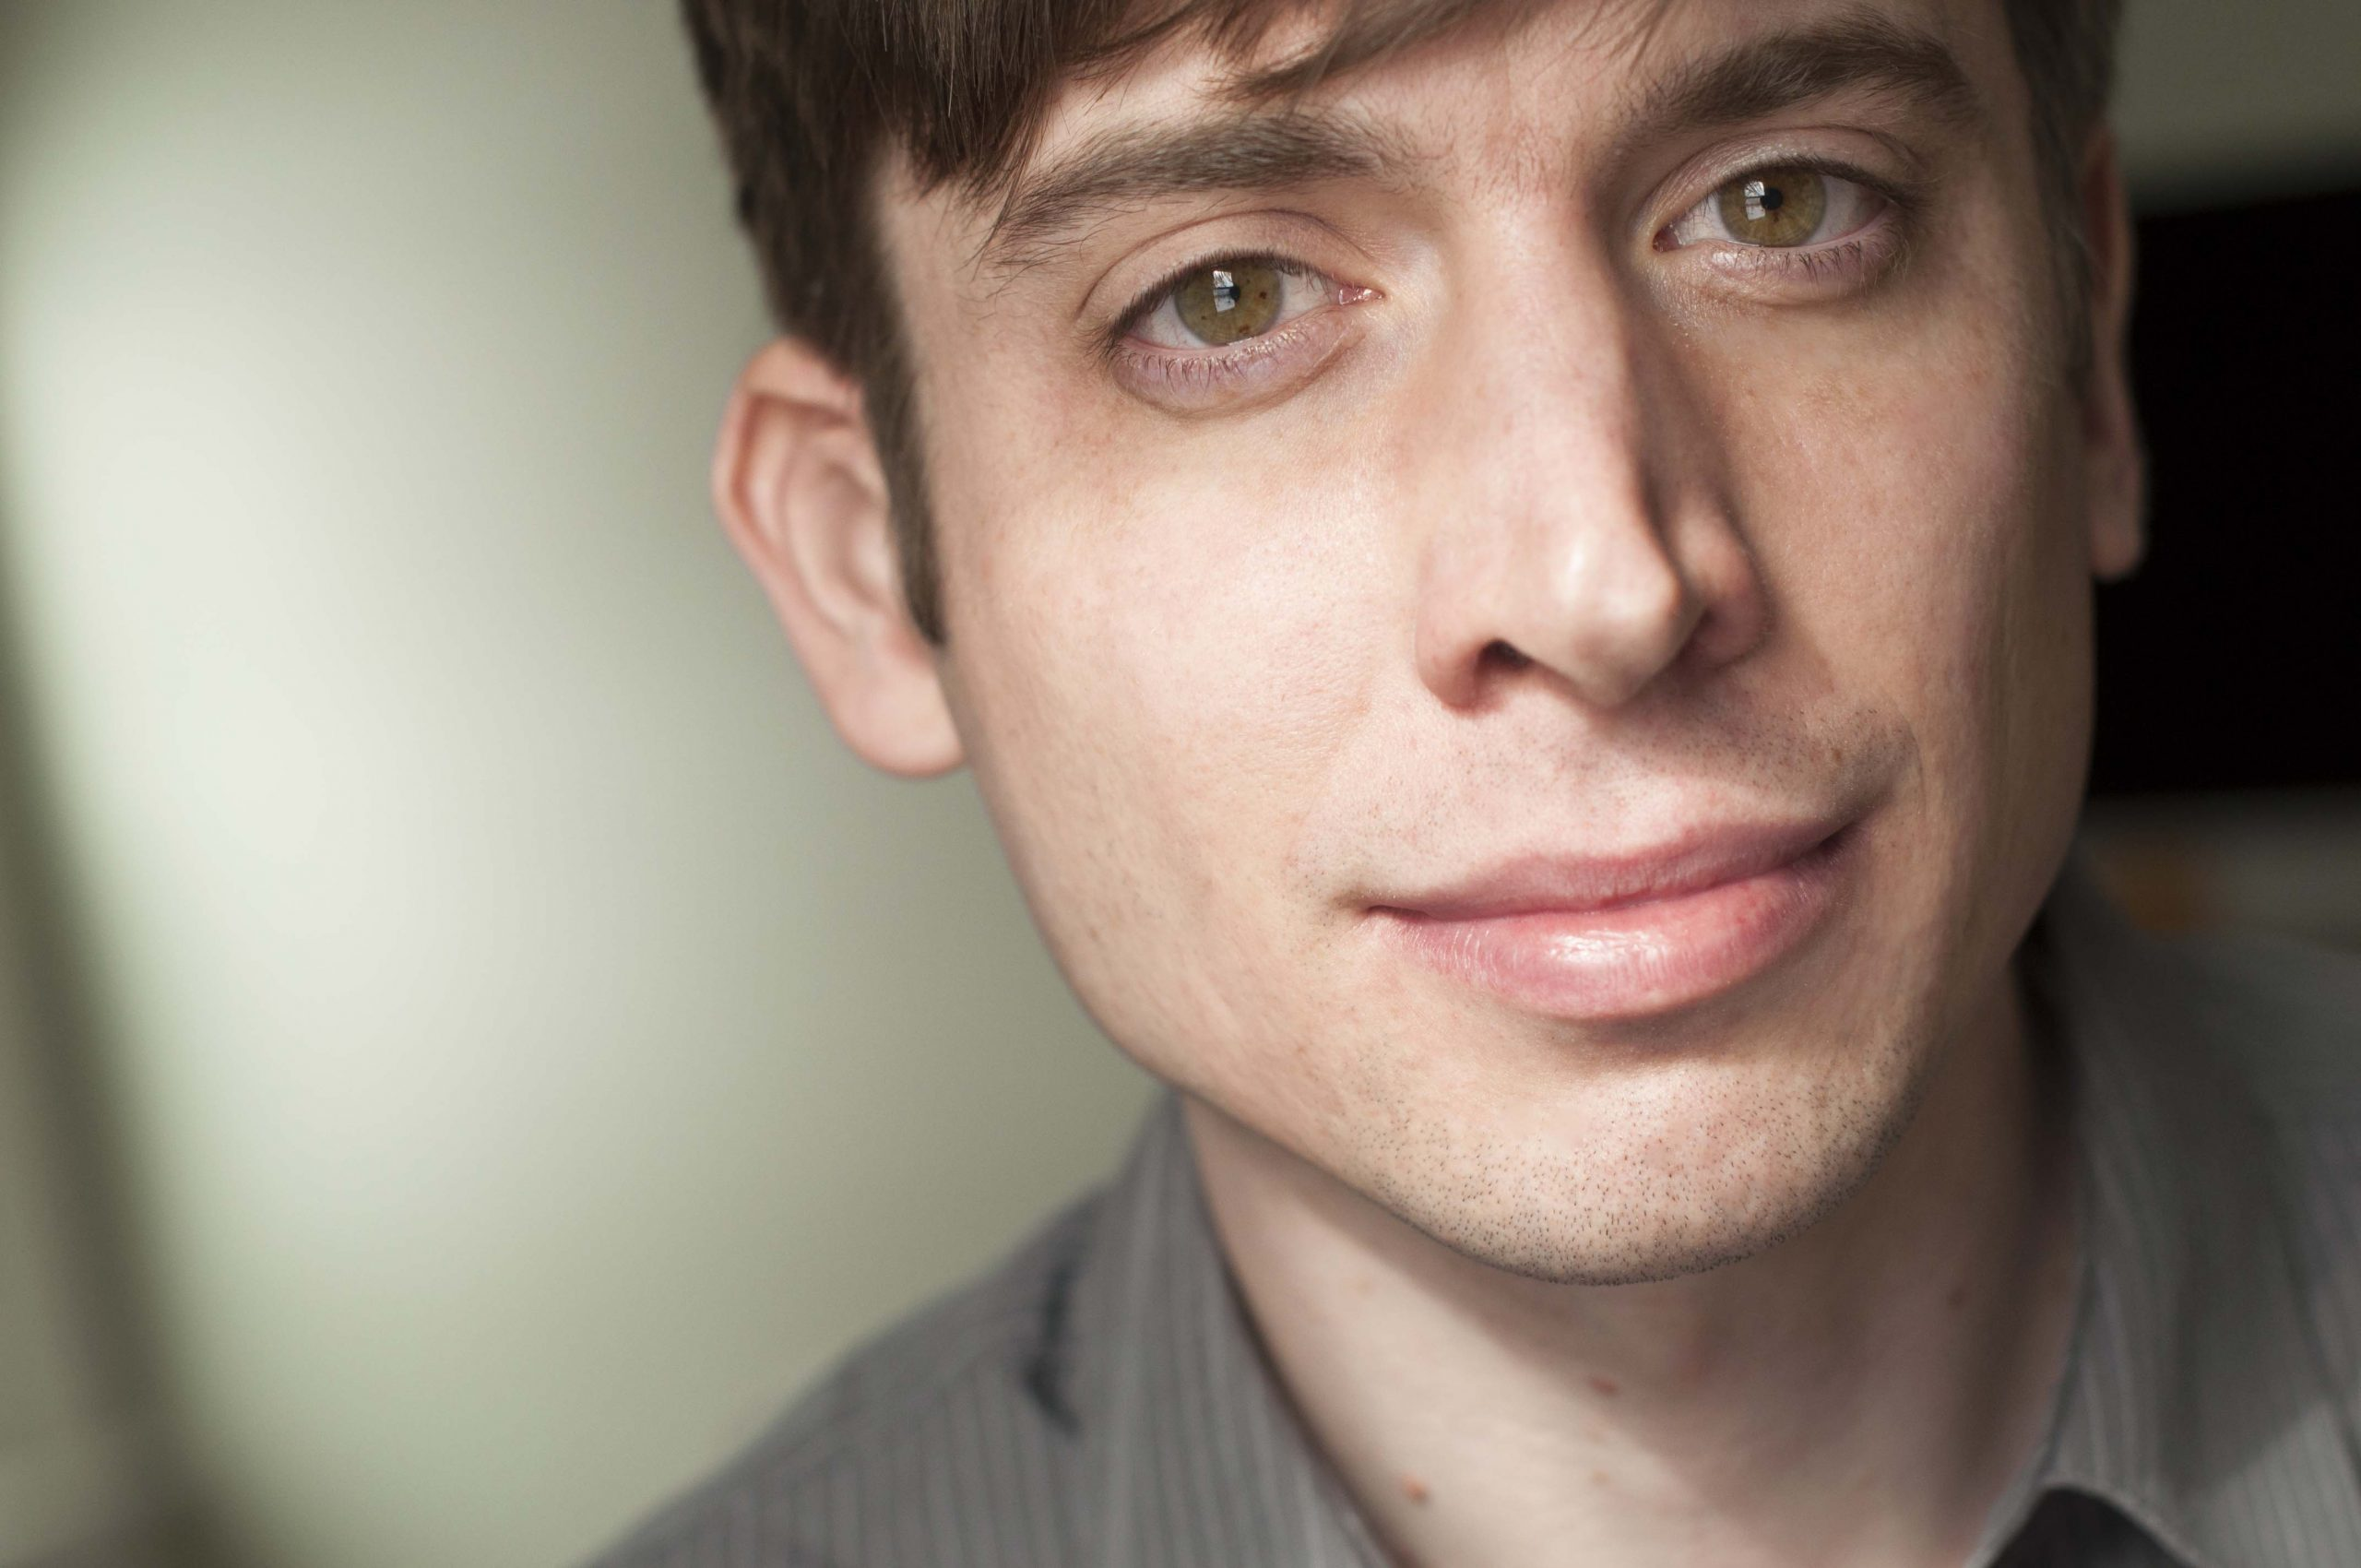 New York-based composer Matt Sargent